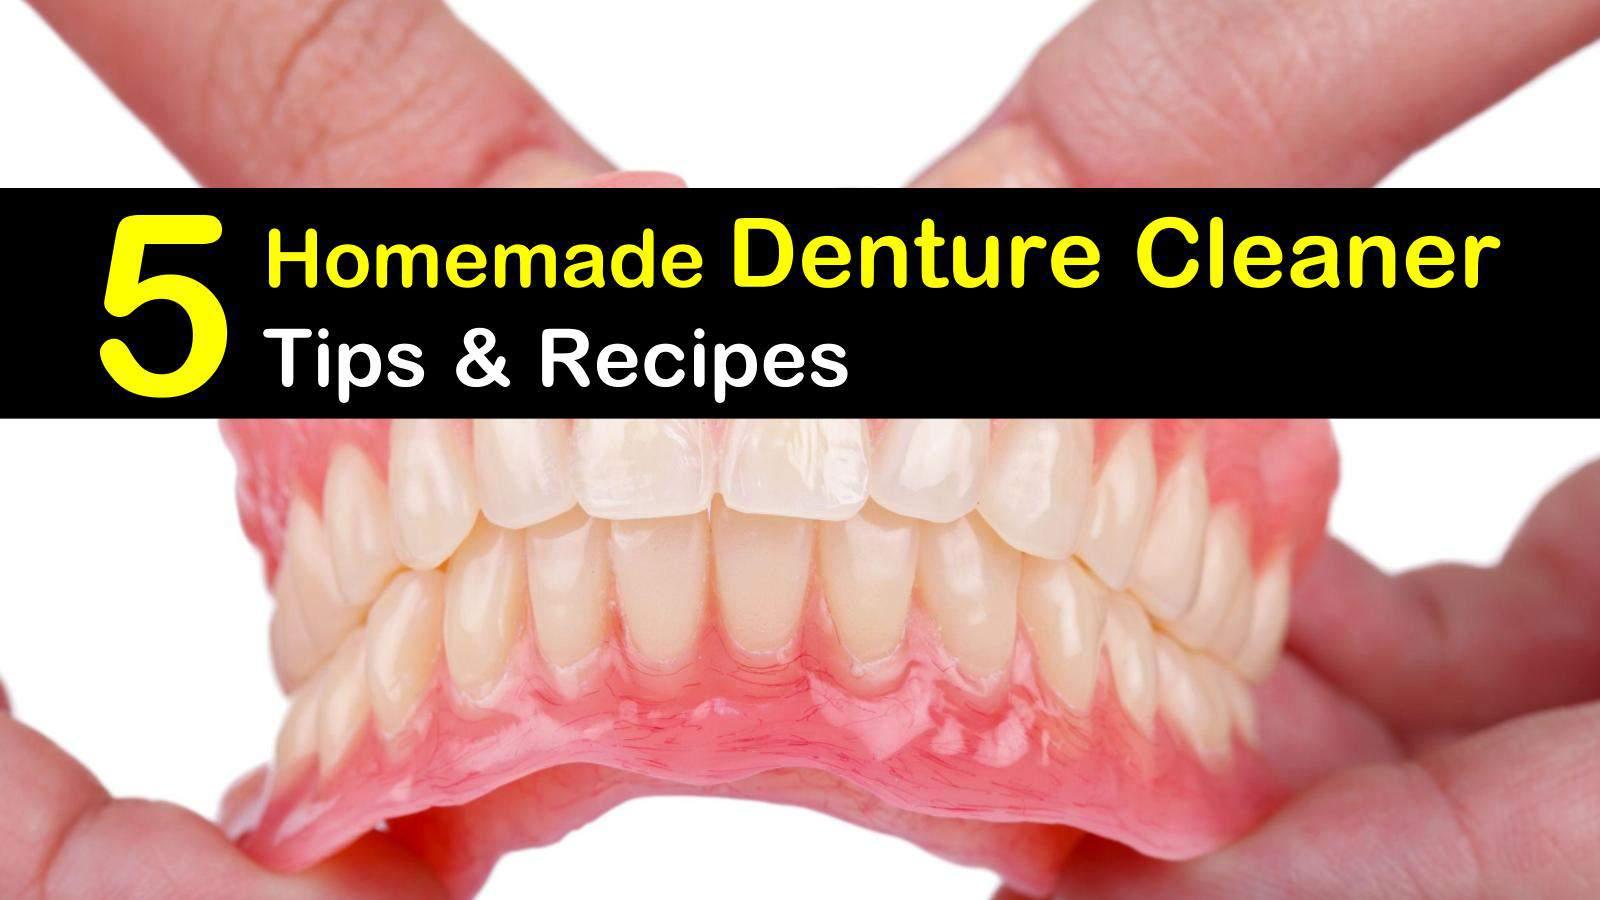 homemade denture cleaner titleimg1